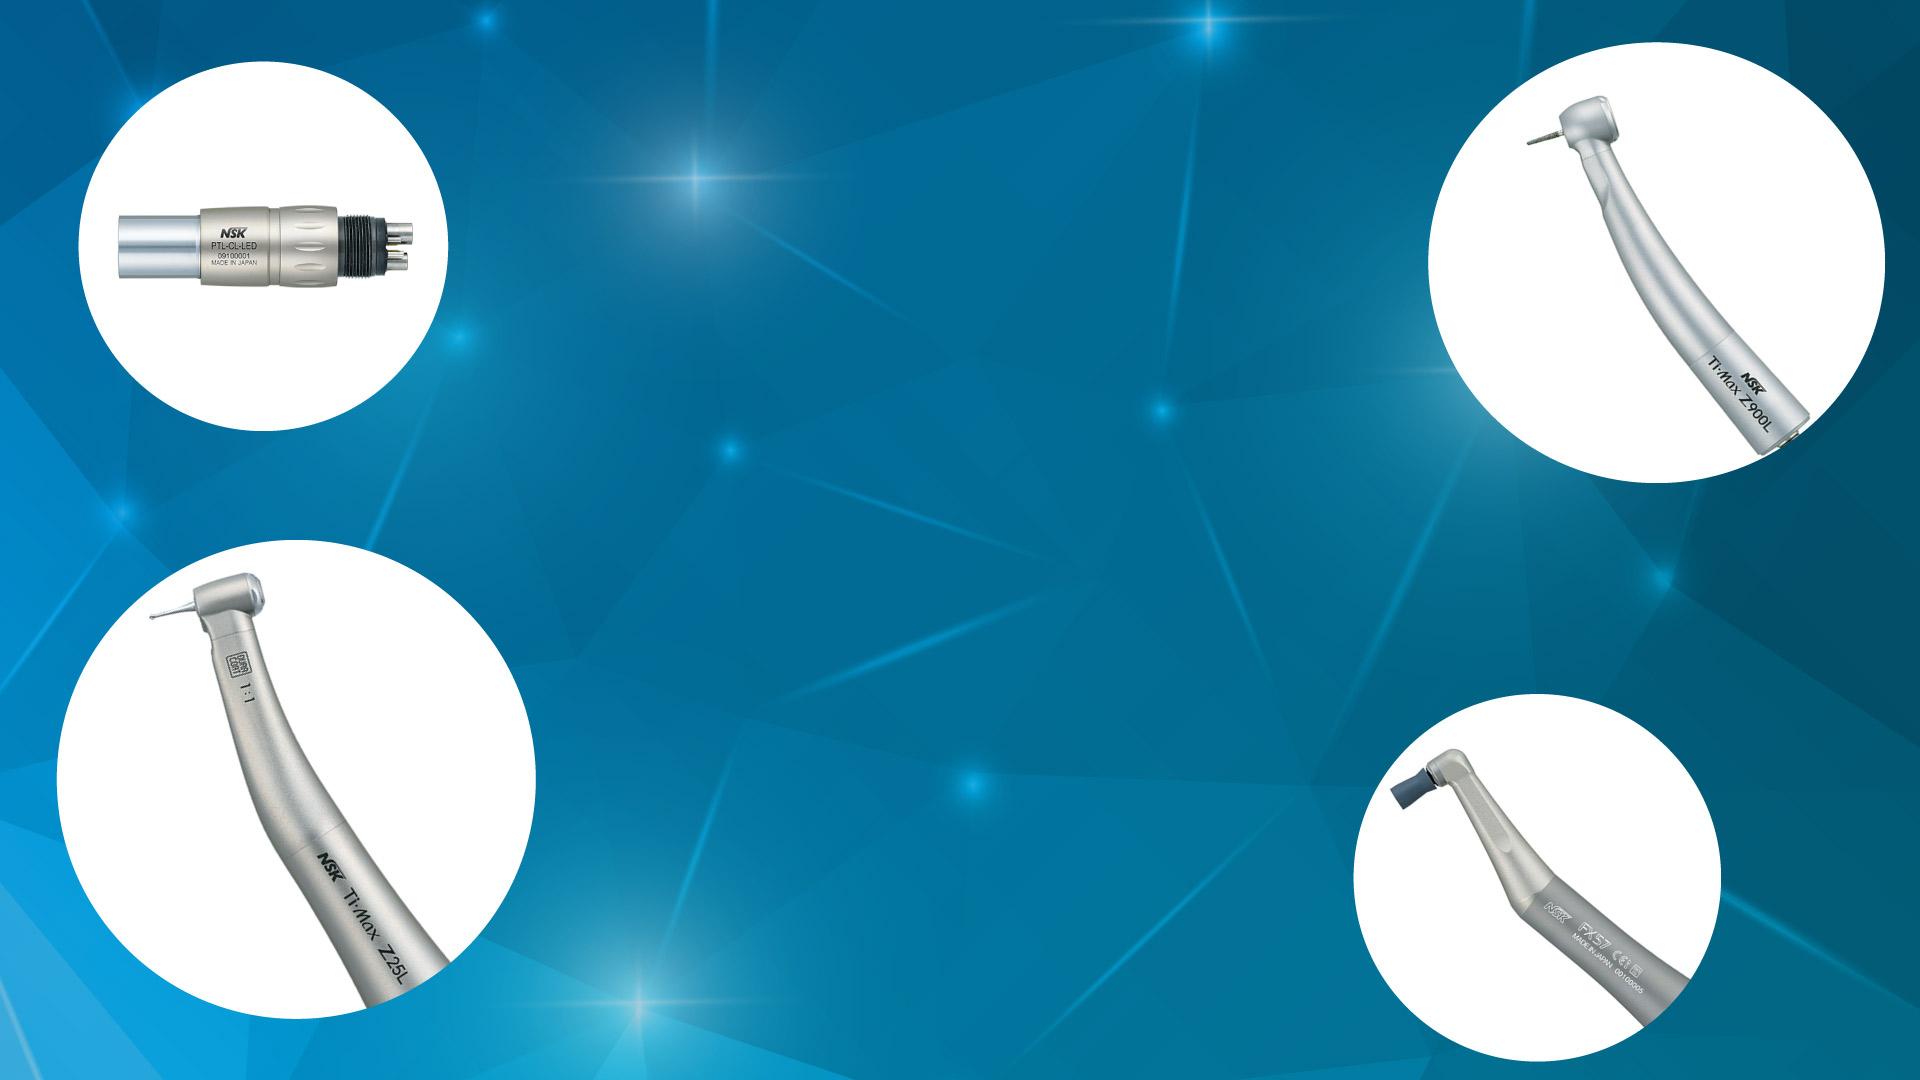 Dental equipment buyers guide | dental chair | dental cabinets.